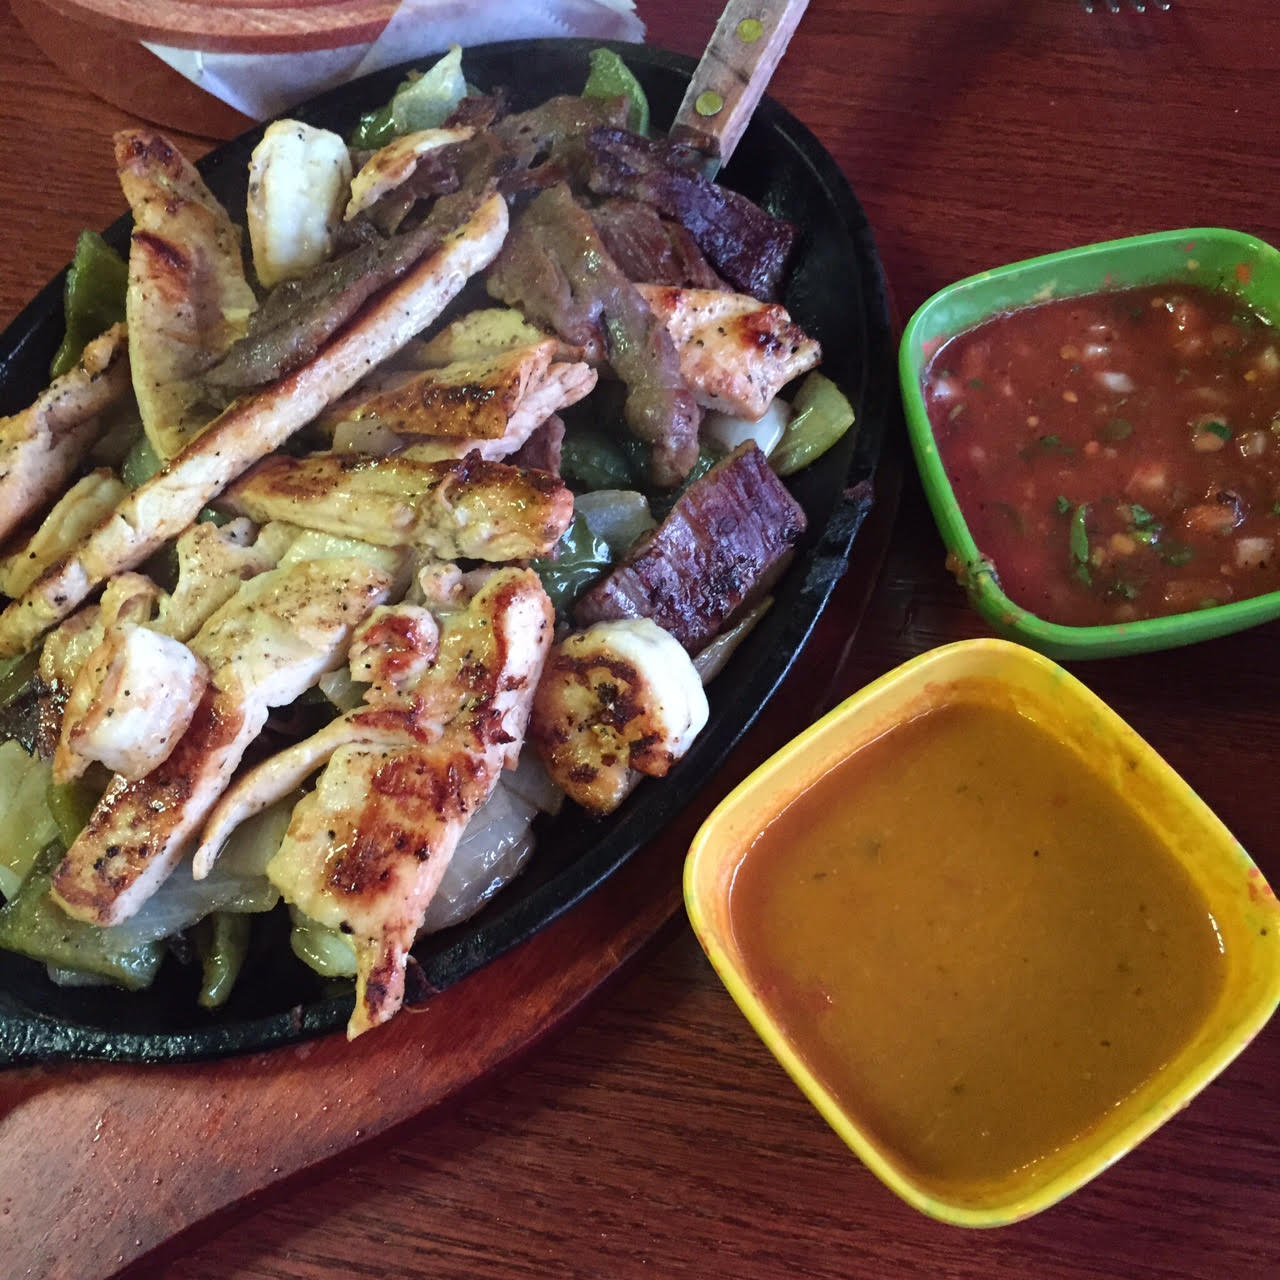 Best Restaurants In Downtown Waco Tx